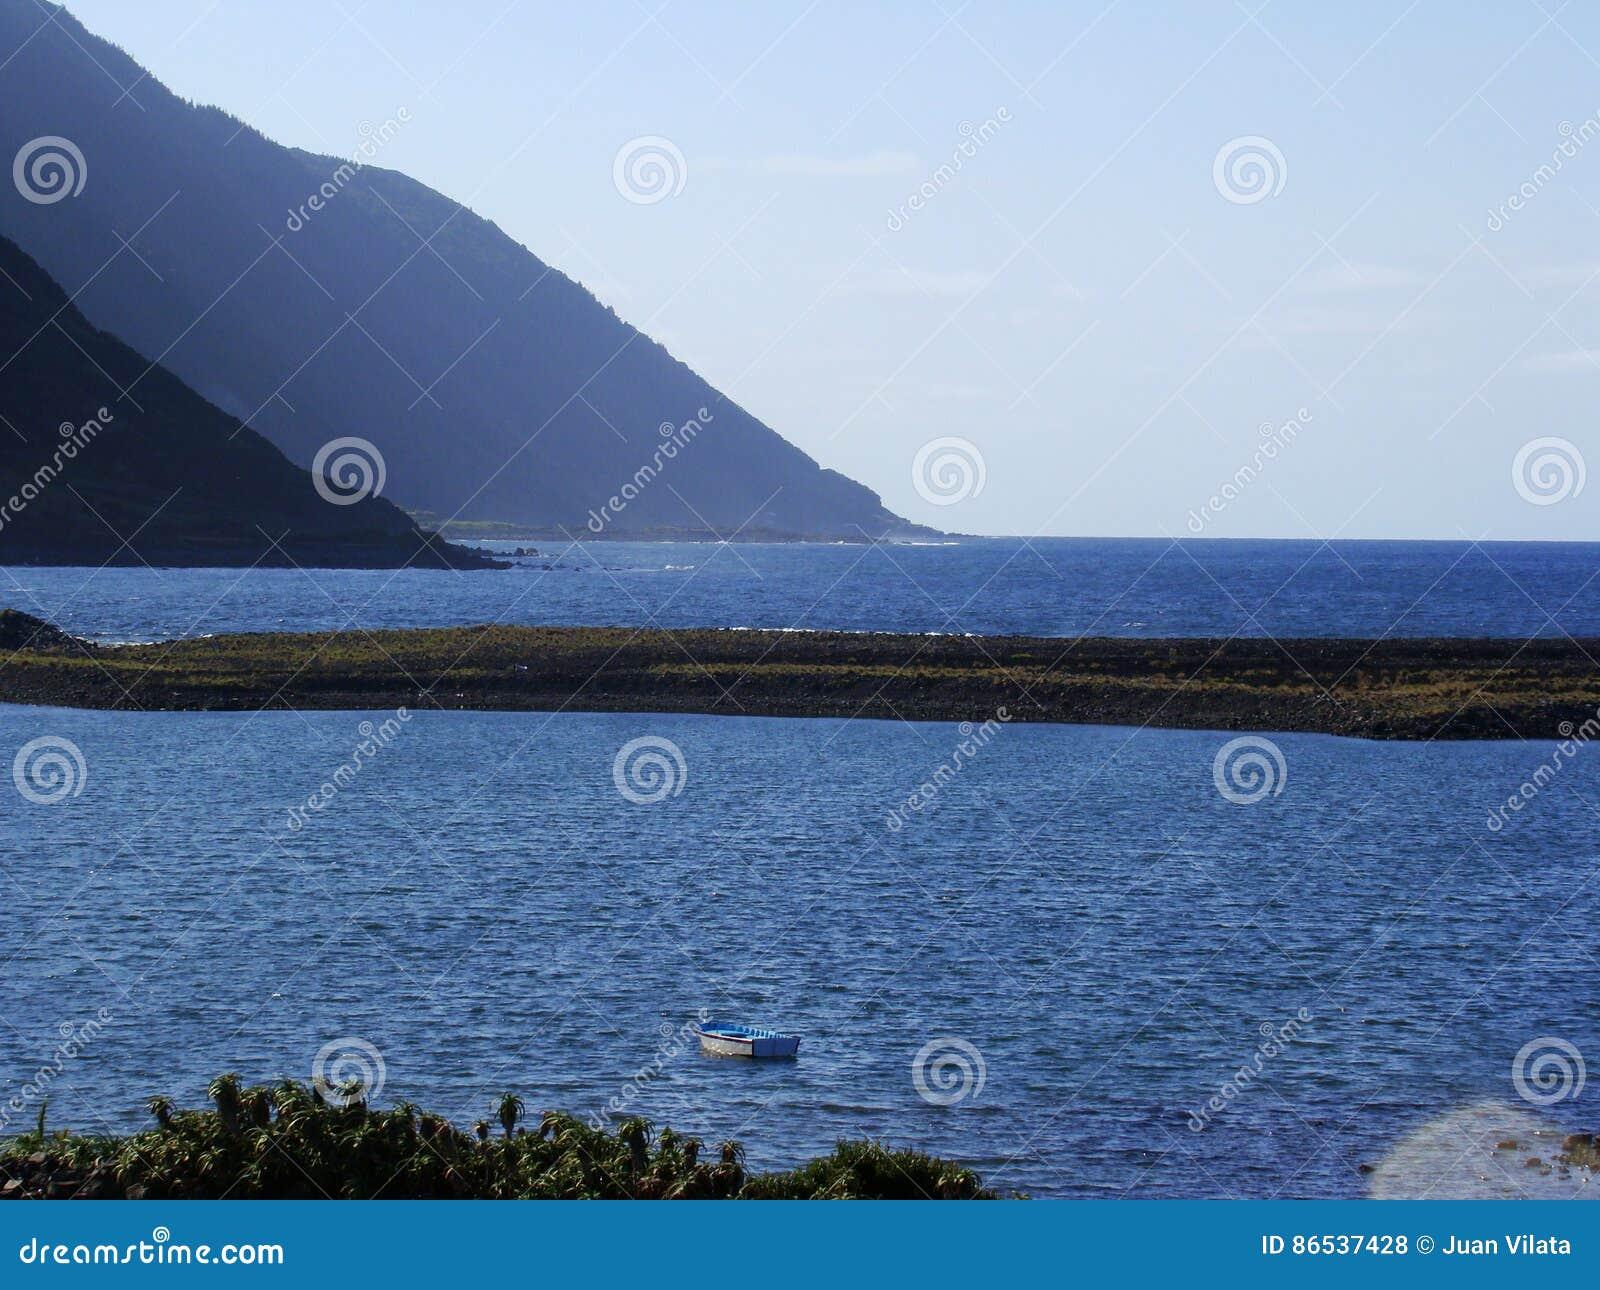 Sao_Jorge_island_Azores